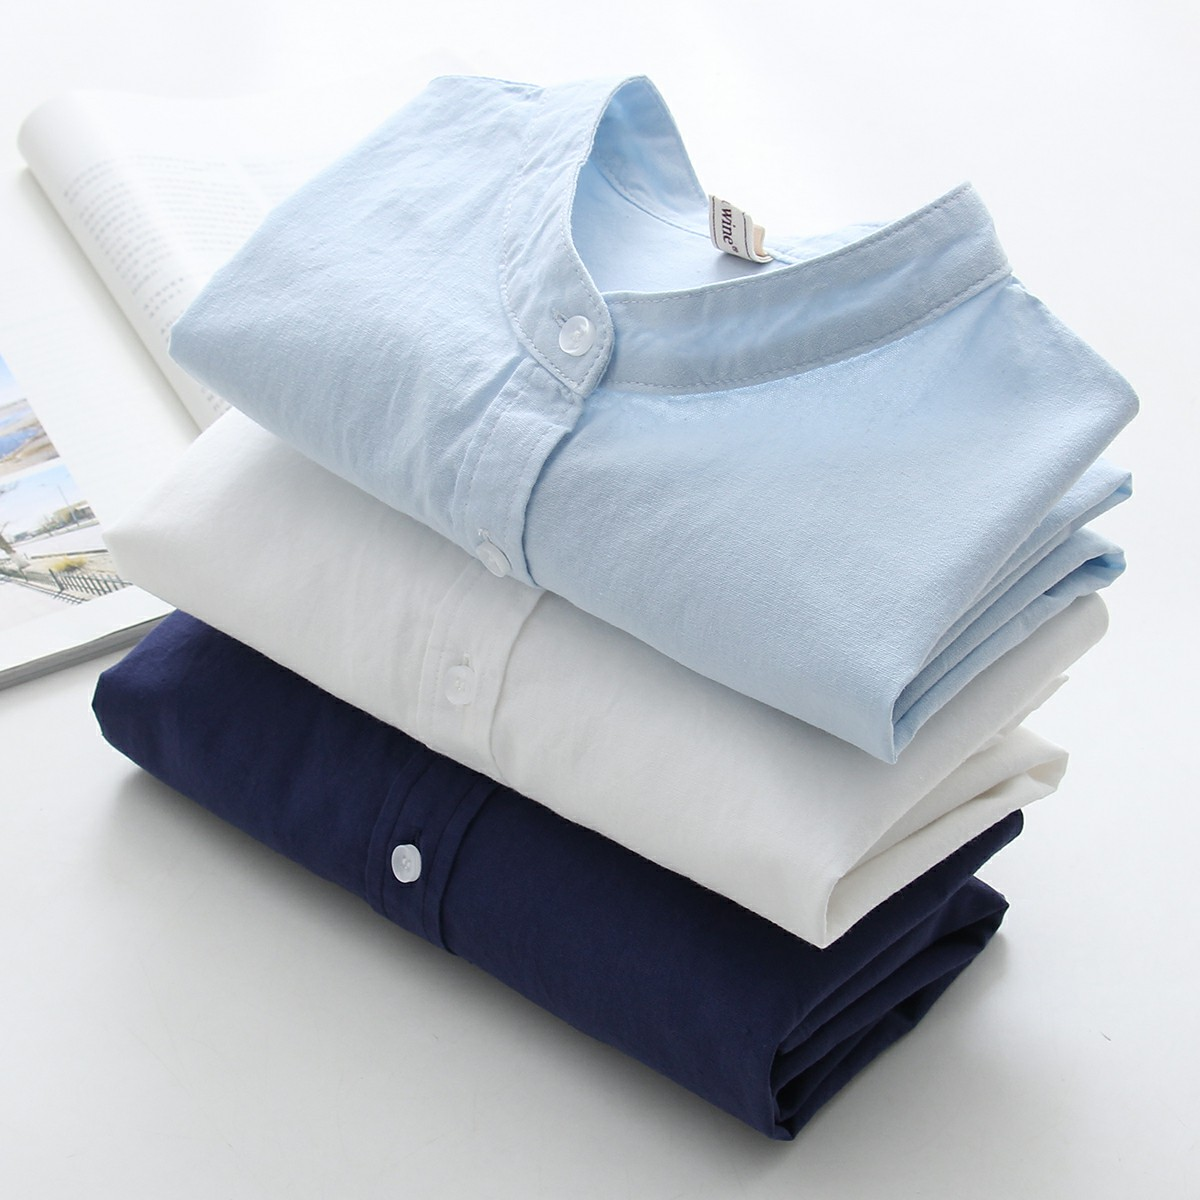 Womens Tops And Blouses 2019 Fashion Women 100% Cotton Office Shirt Slim Long Sl